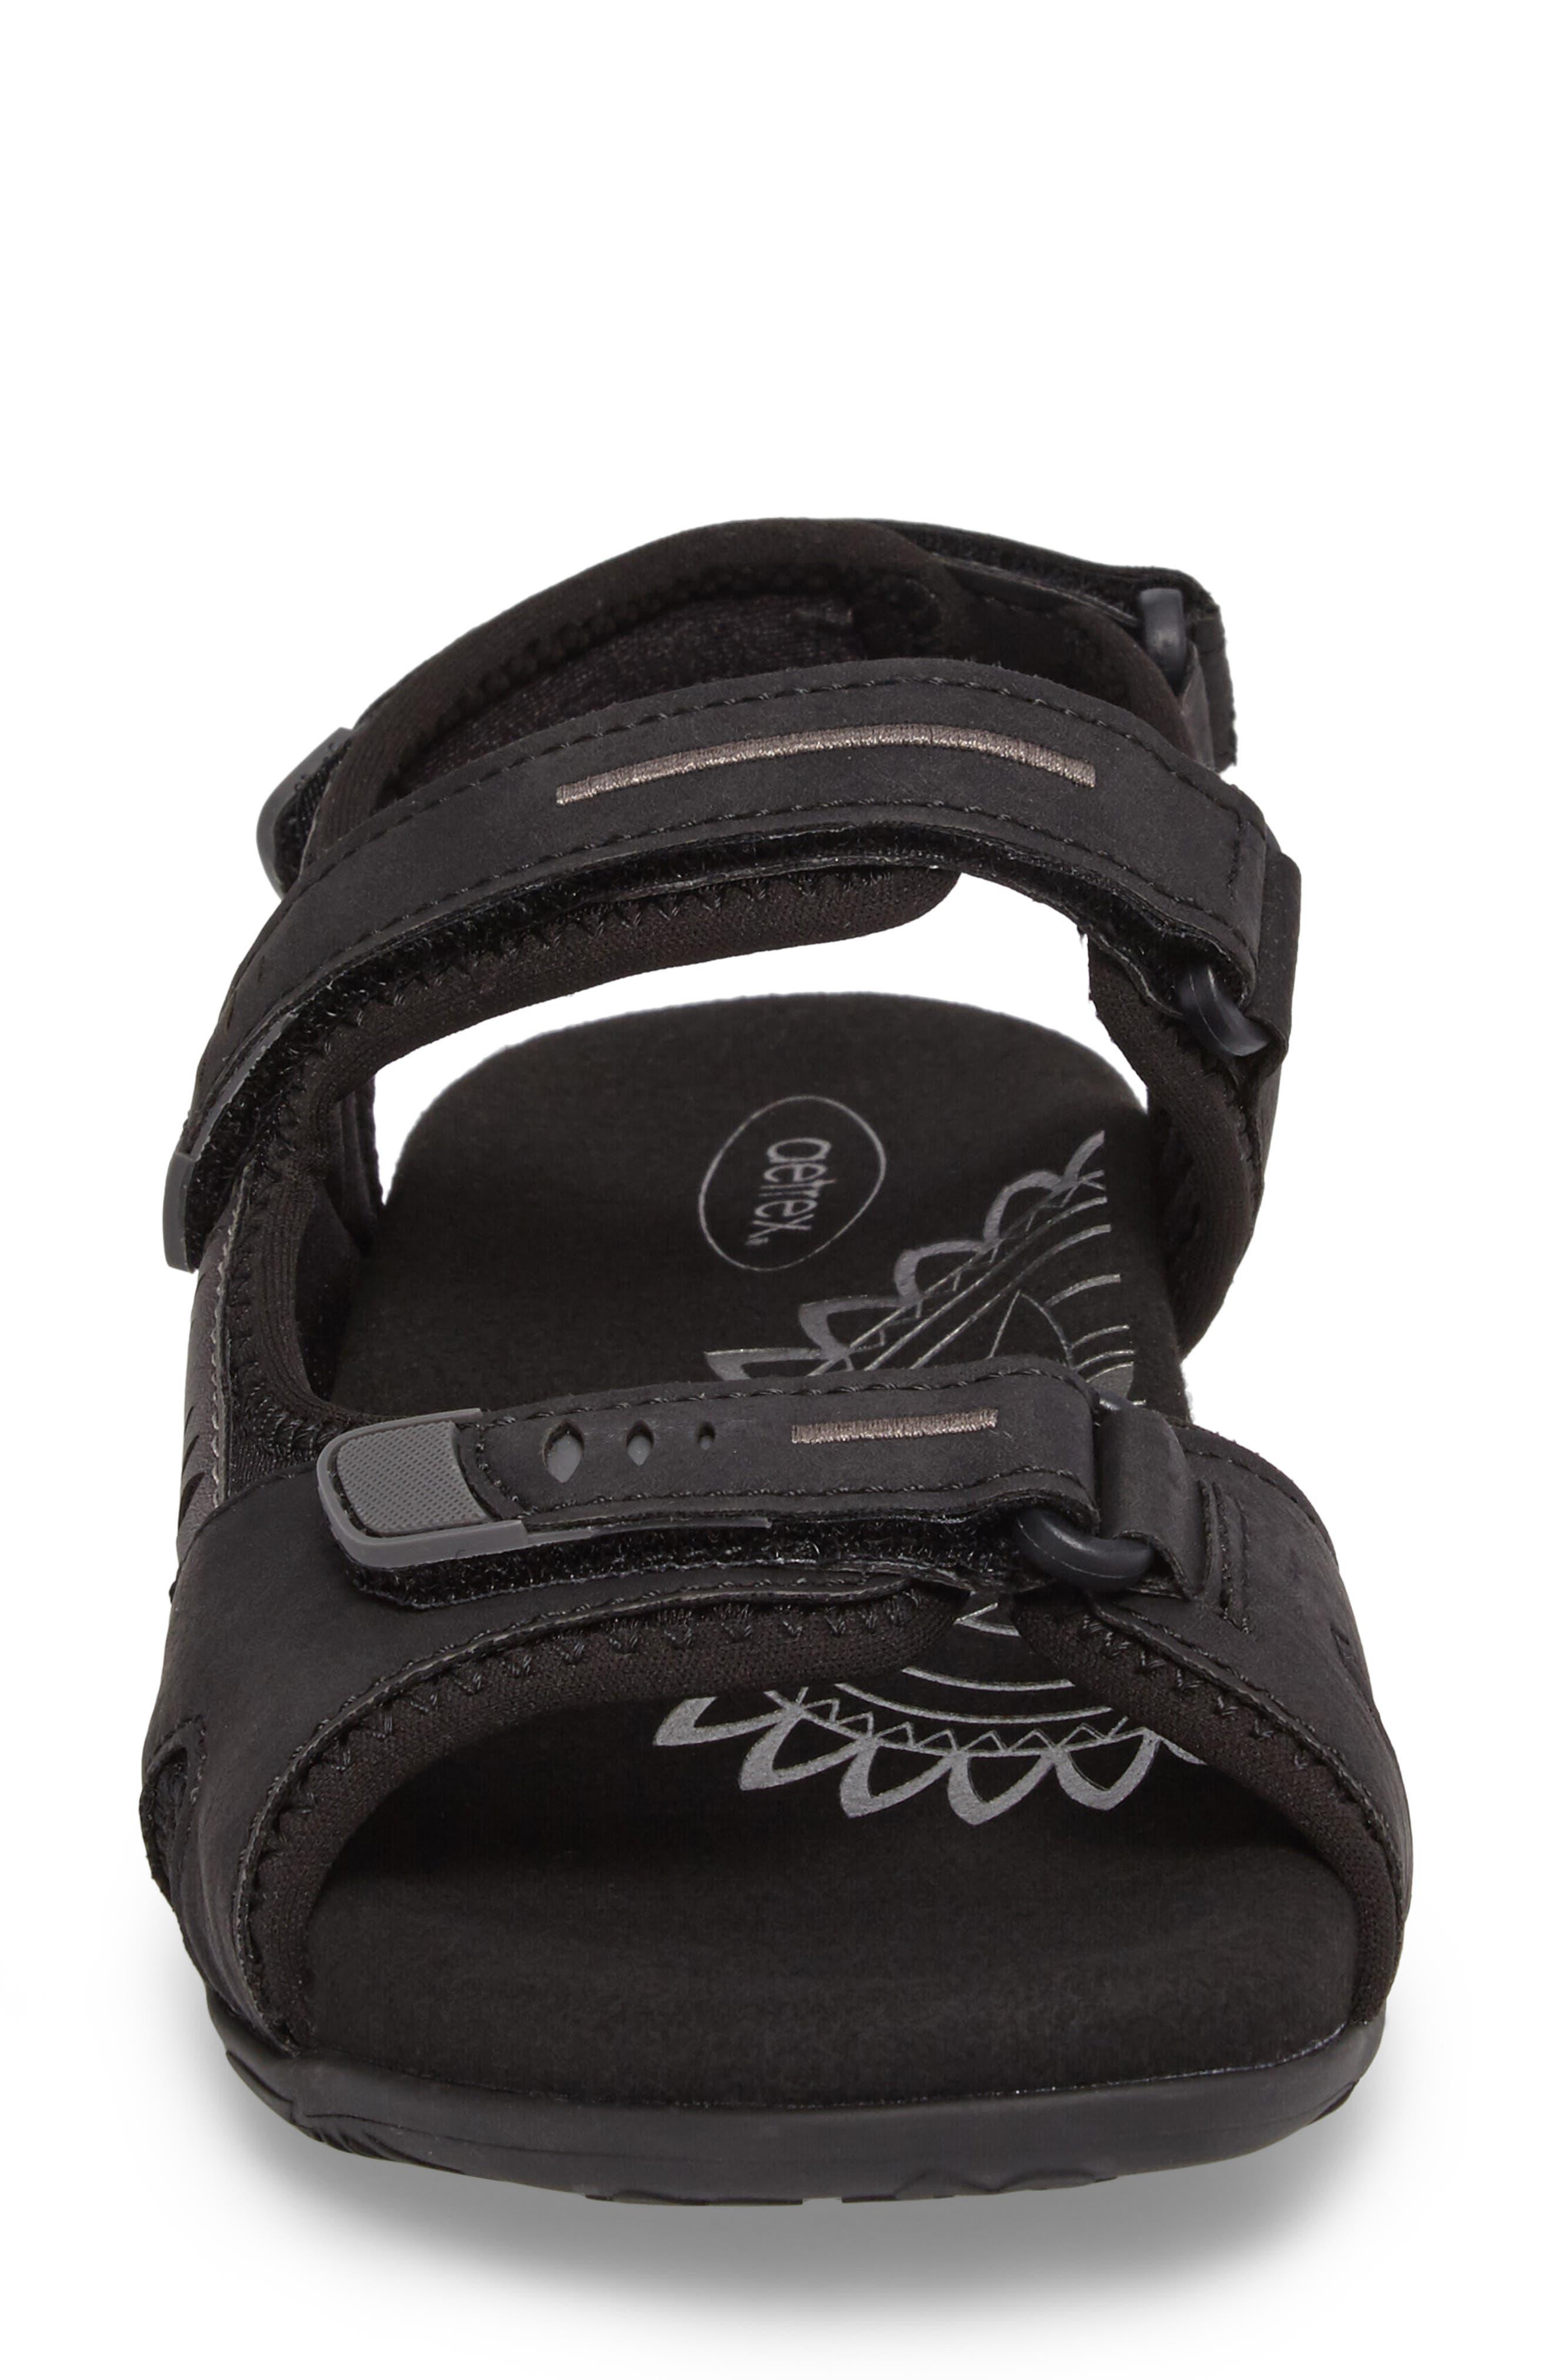 Bree Sport Sandal,                             Alternate thumbnail 4, color,                             001